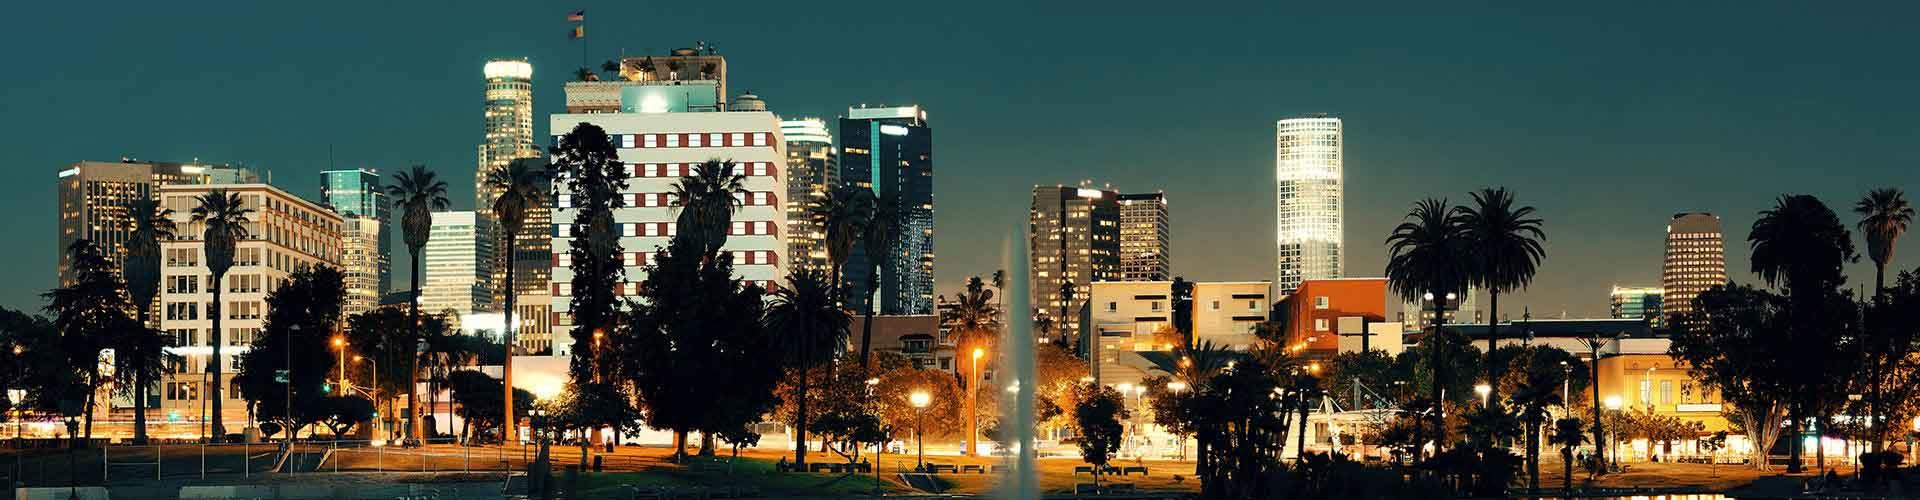 Los Angeles - Hostelů v Los Angeles. Mapy pro Los Angeles, fotky a recenze pro každý hostel v Los Angeles.